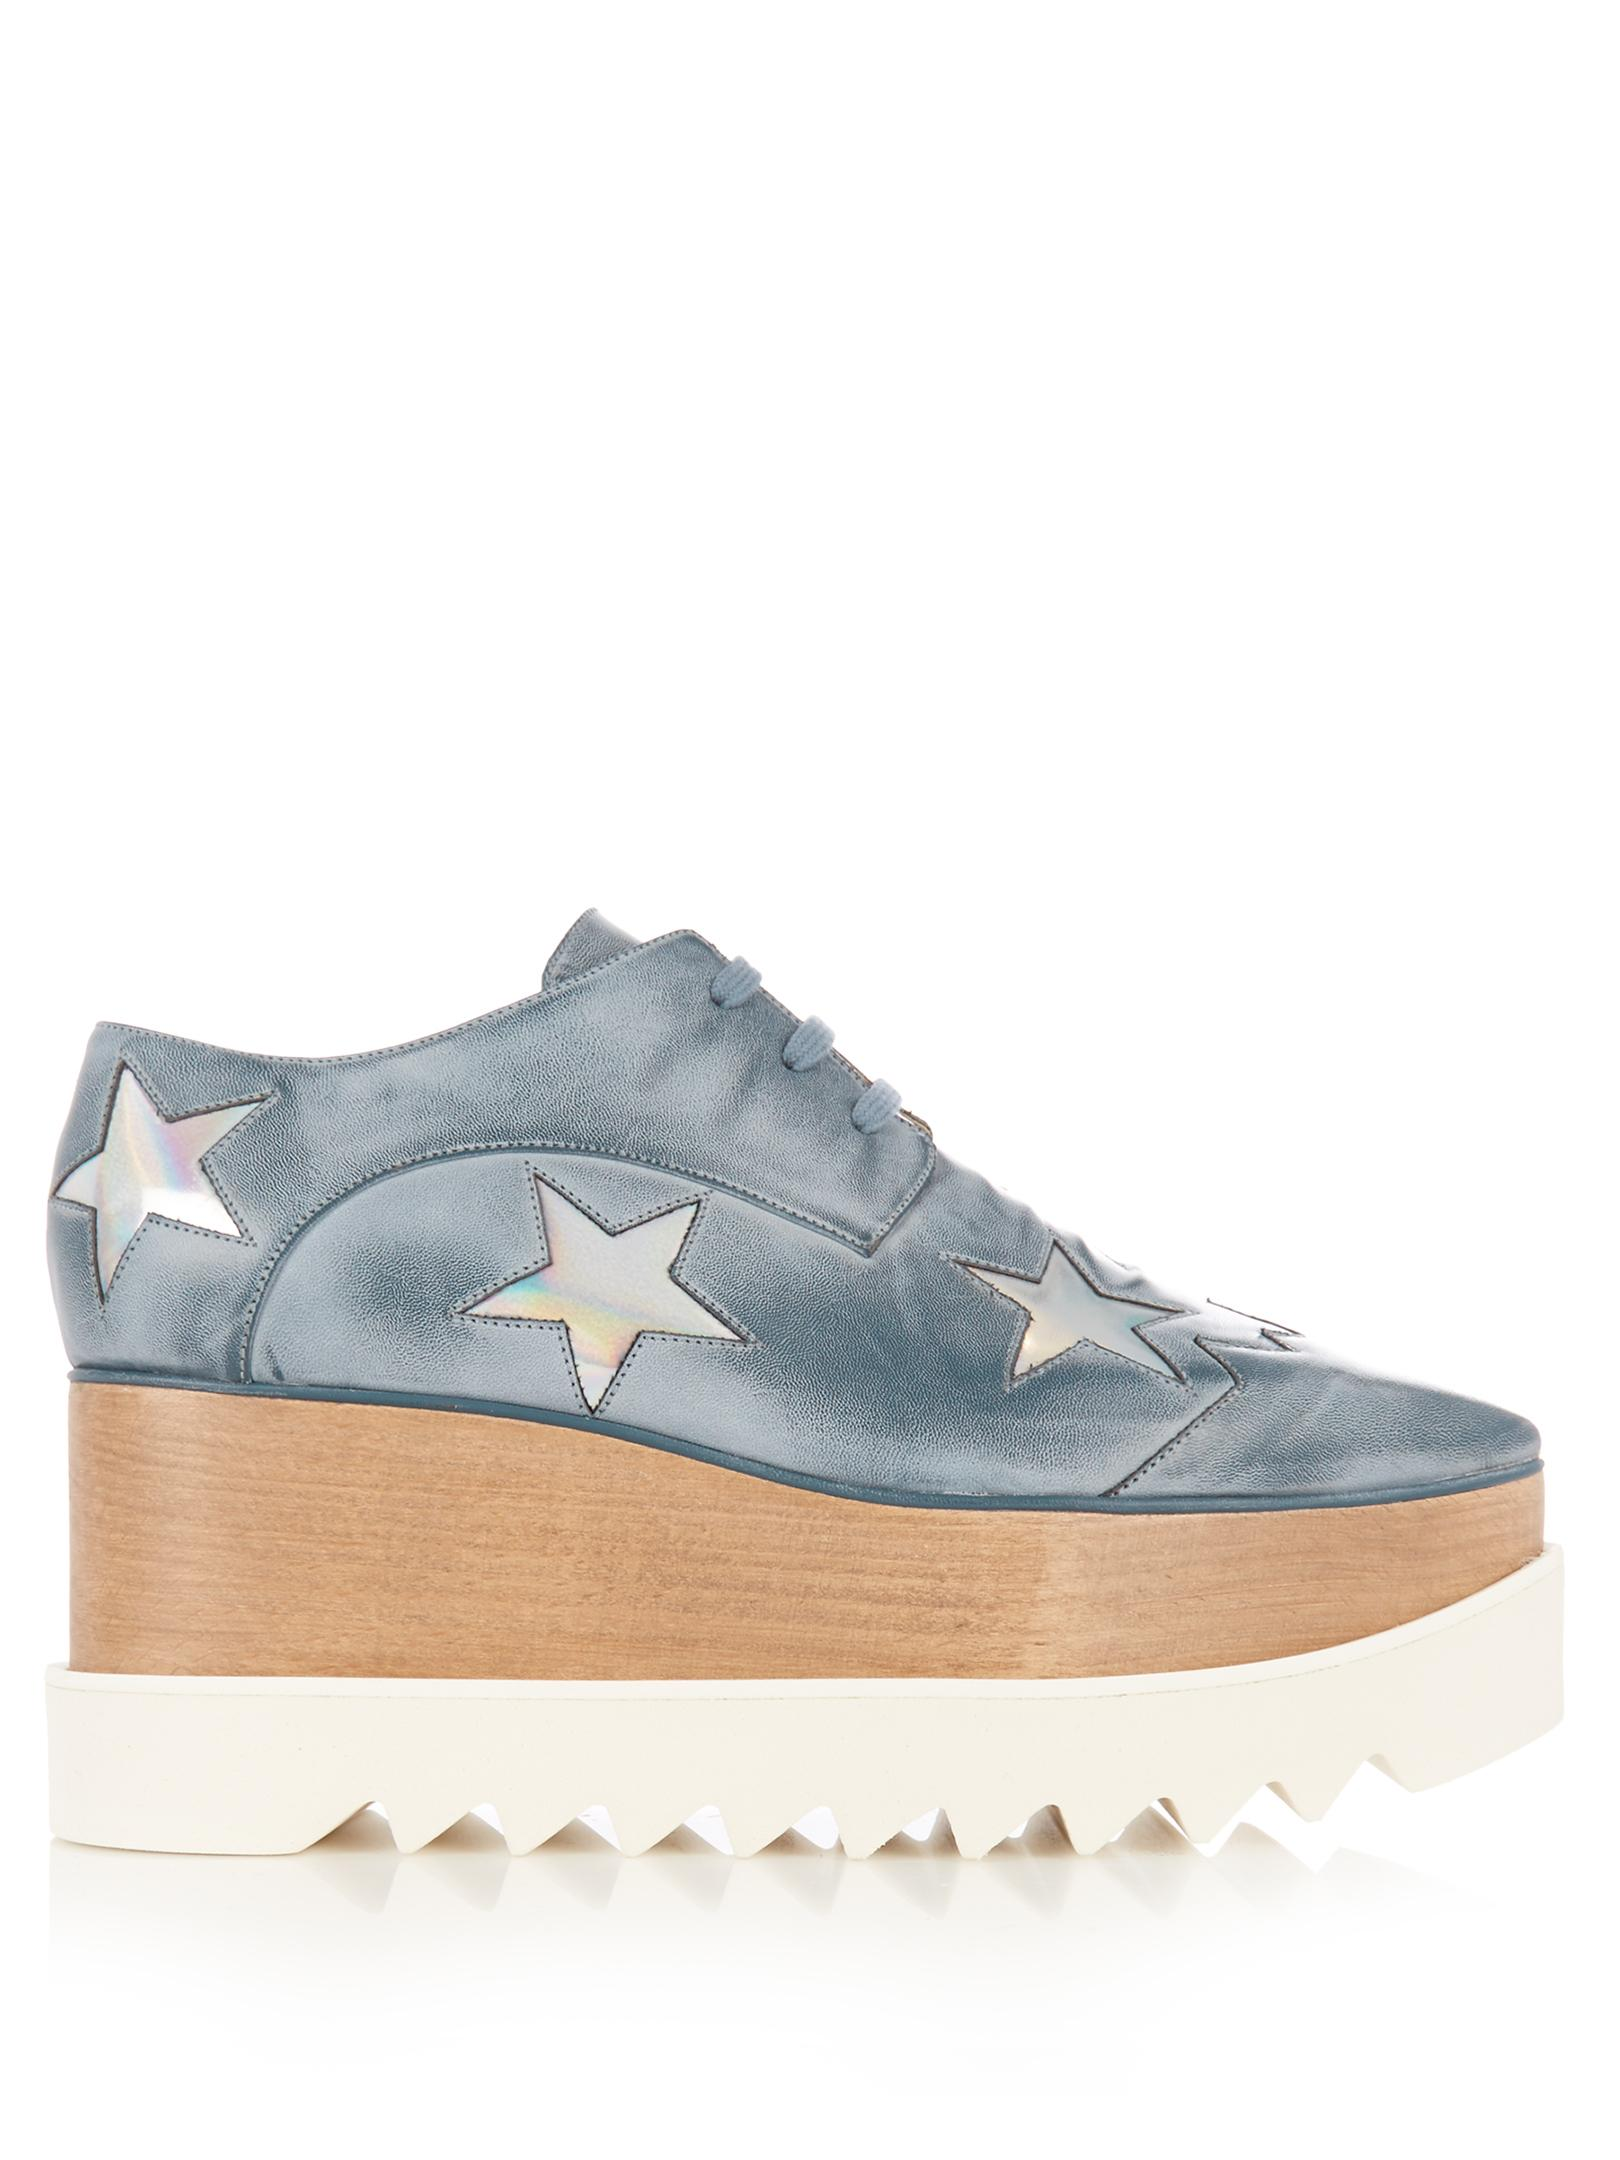 20b88dfb5a4 Lyst - Stella McCartney Elyse Lace-up Platform Shoes in Blue